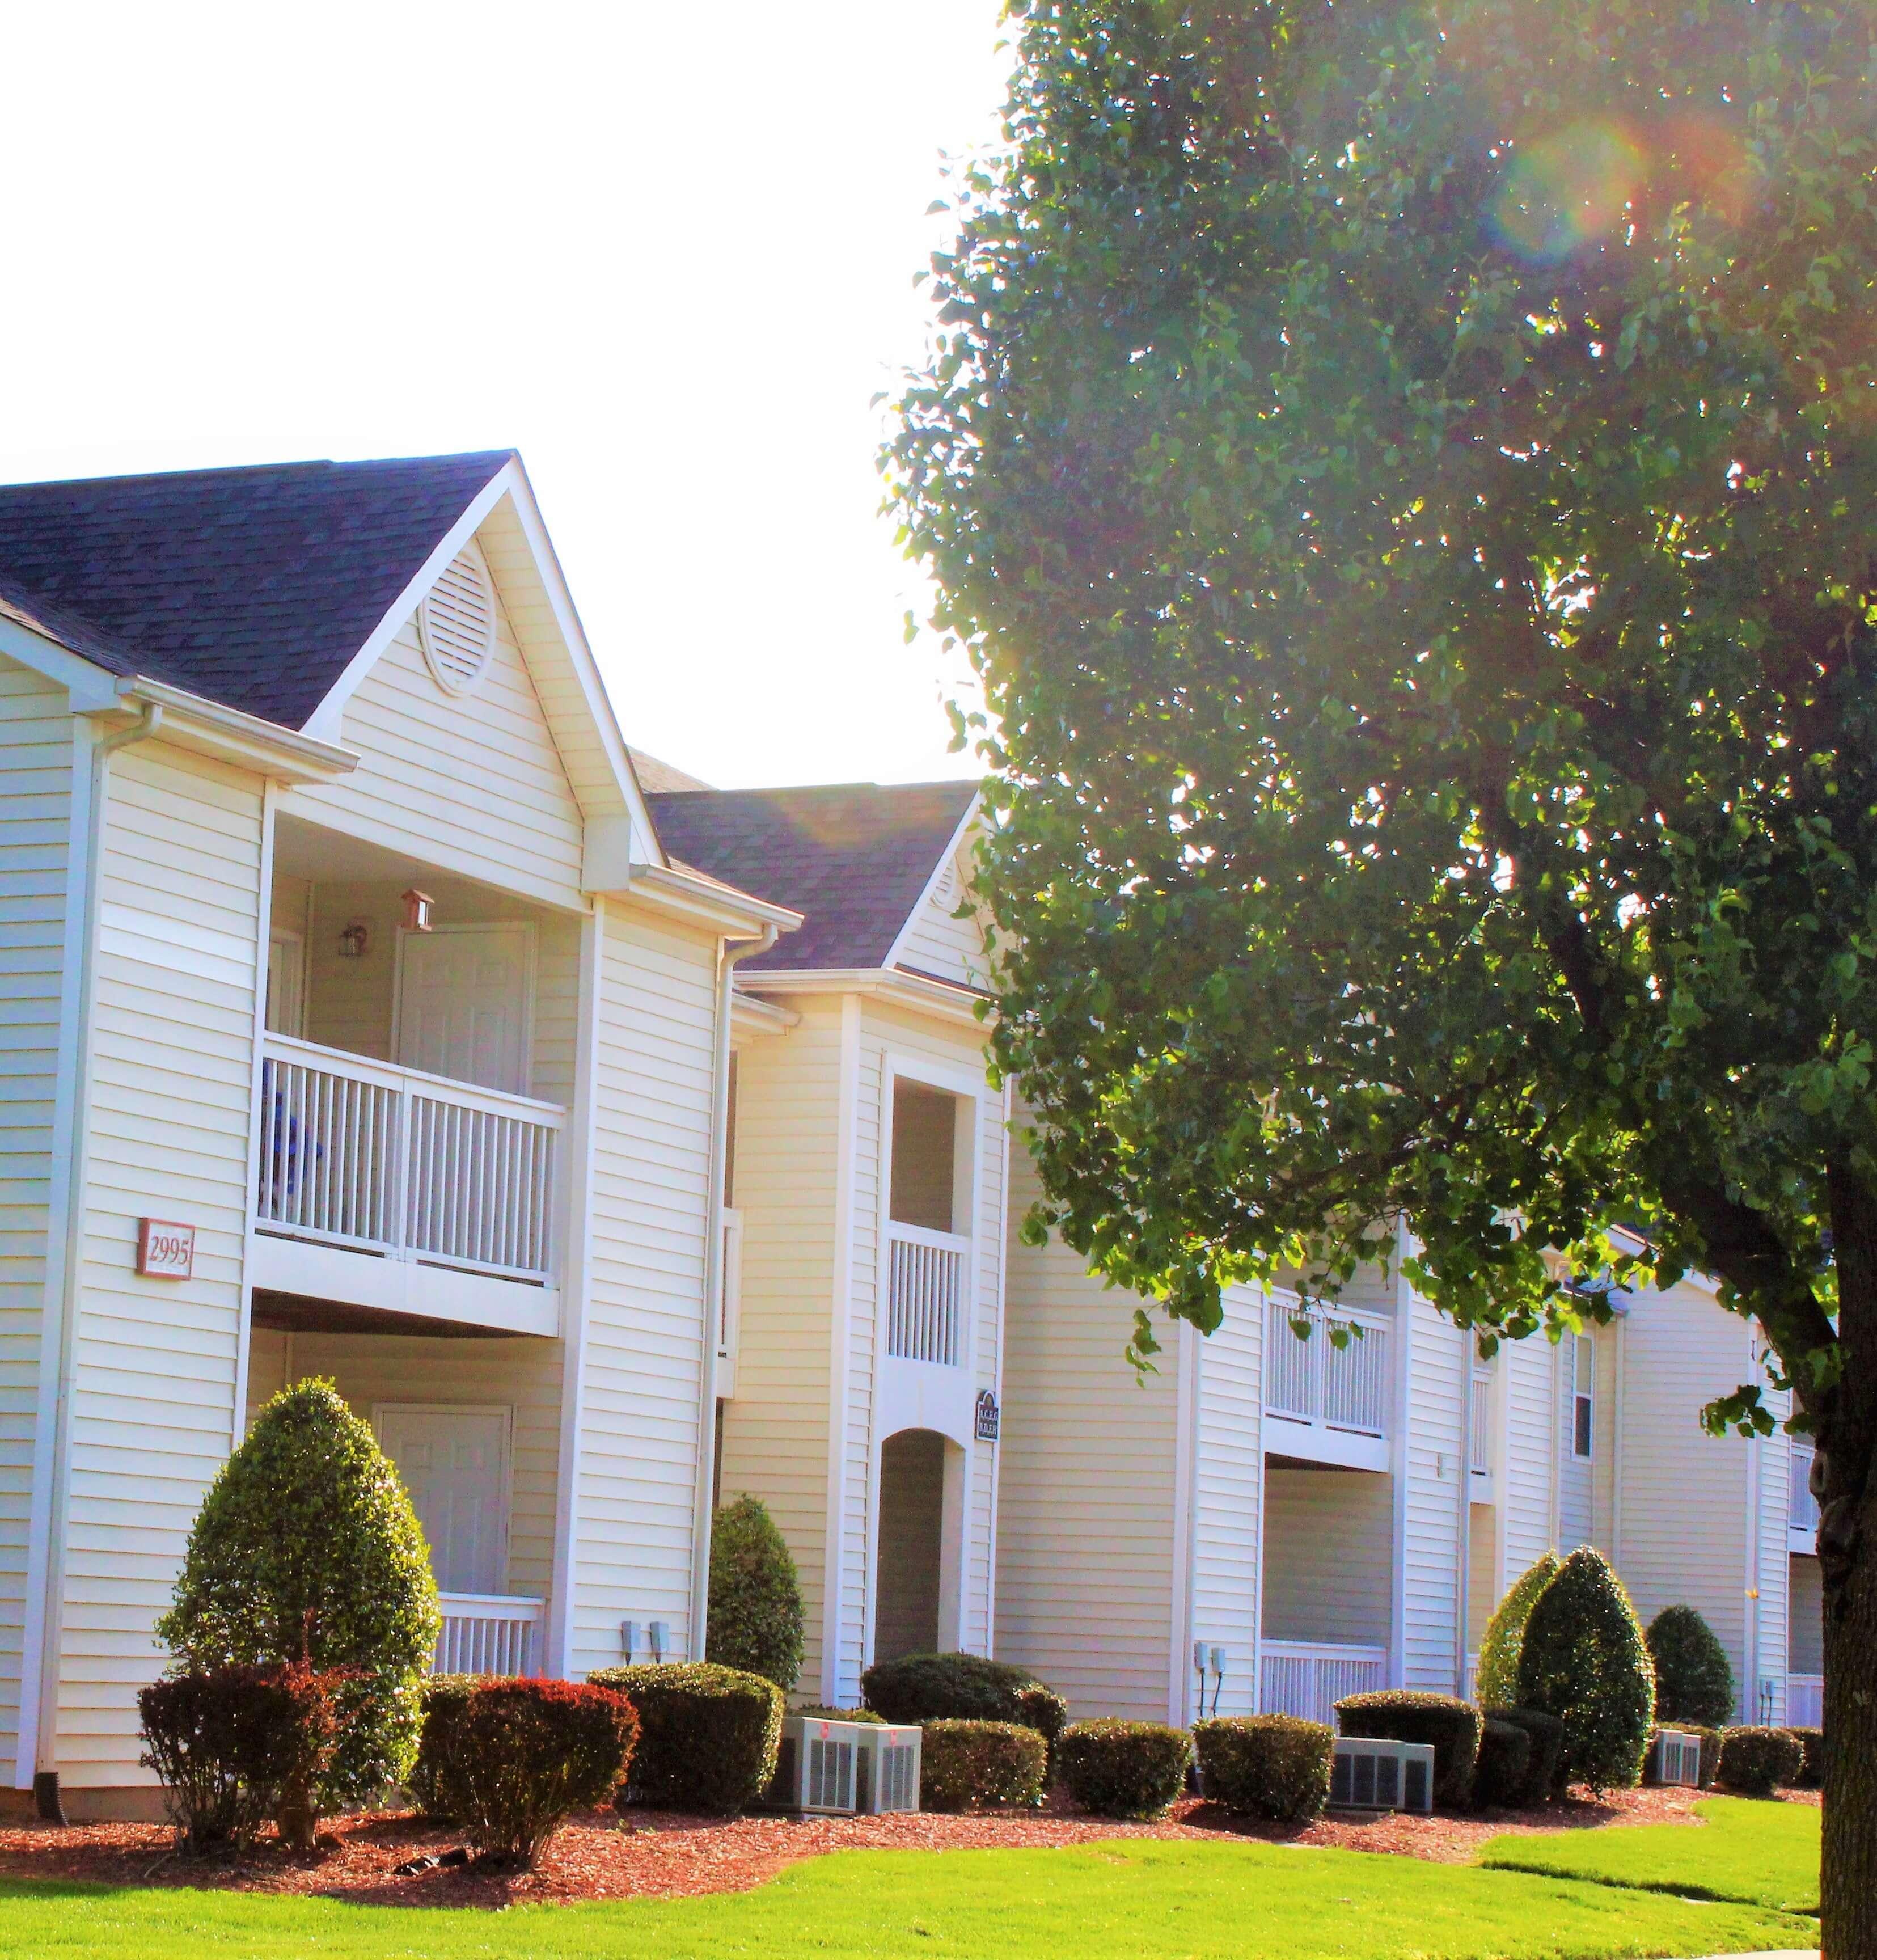 Millcreek Apartments: Mills Creek Apartments 3016 Seth Court, Gastonia, NC 28054